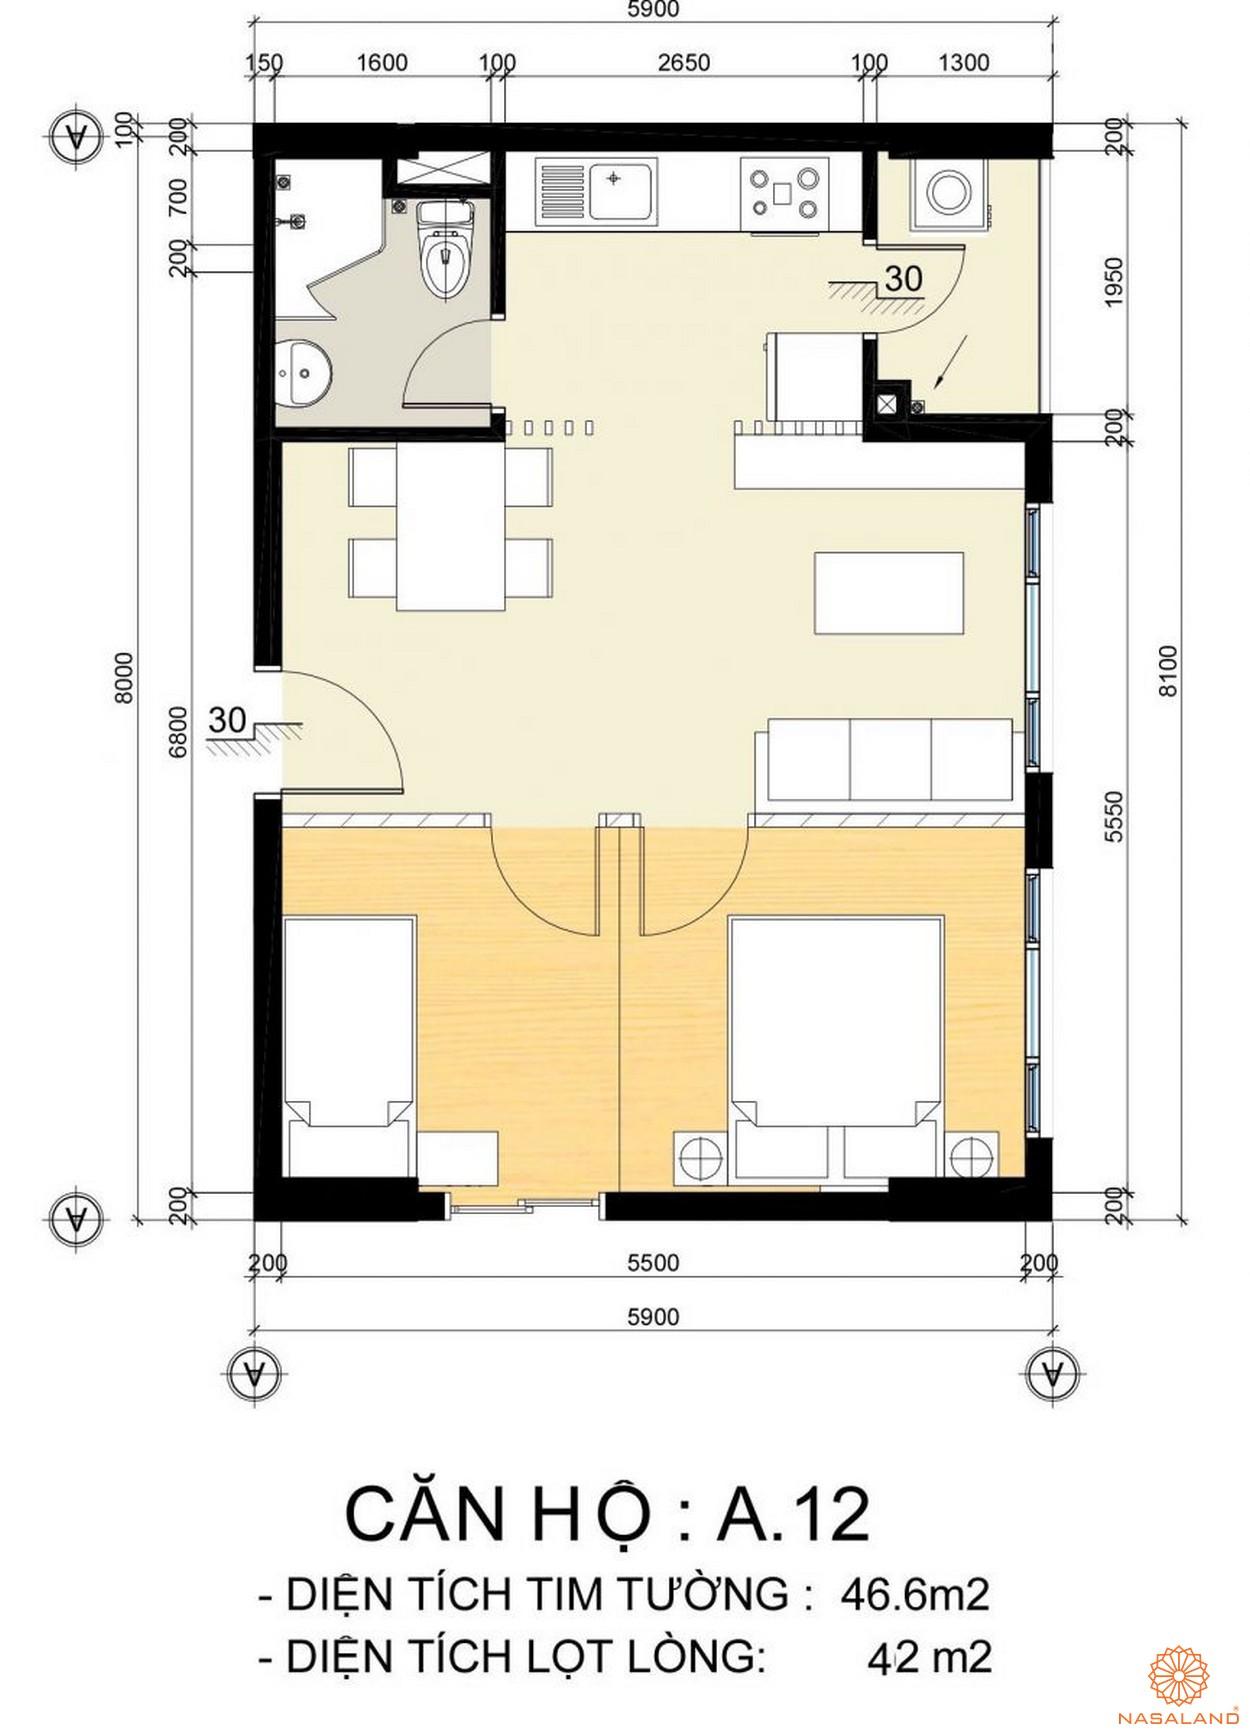 Mặt bằng căn hộ A.12